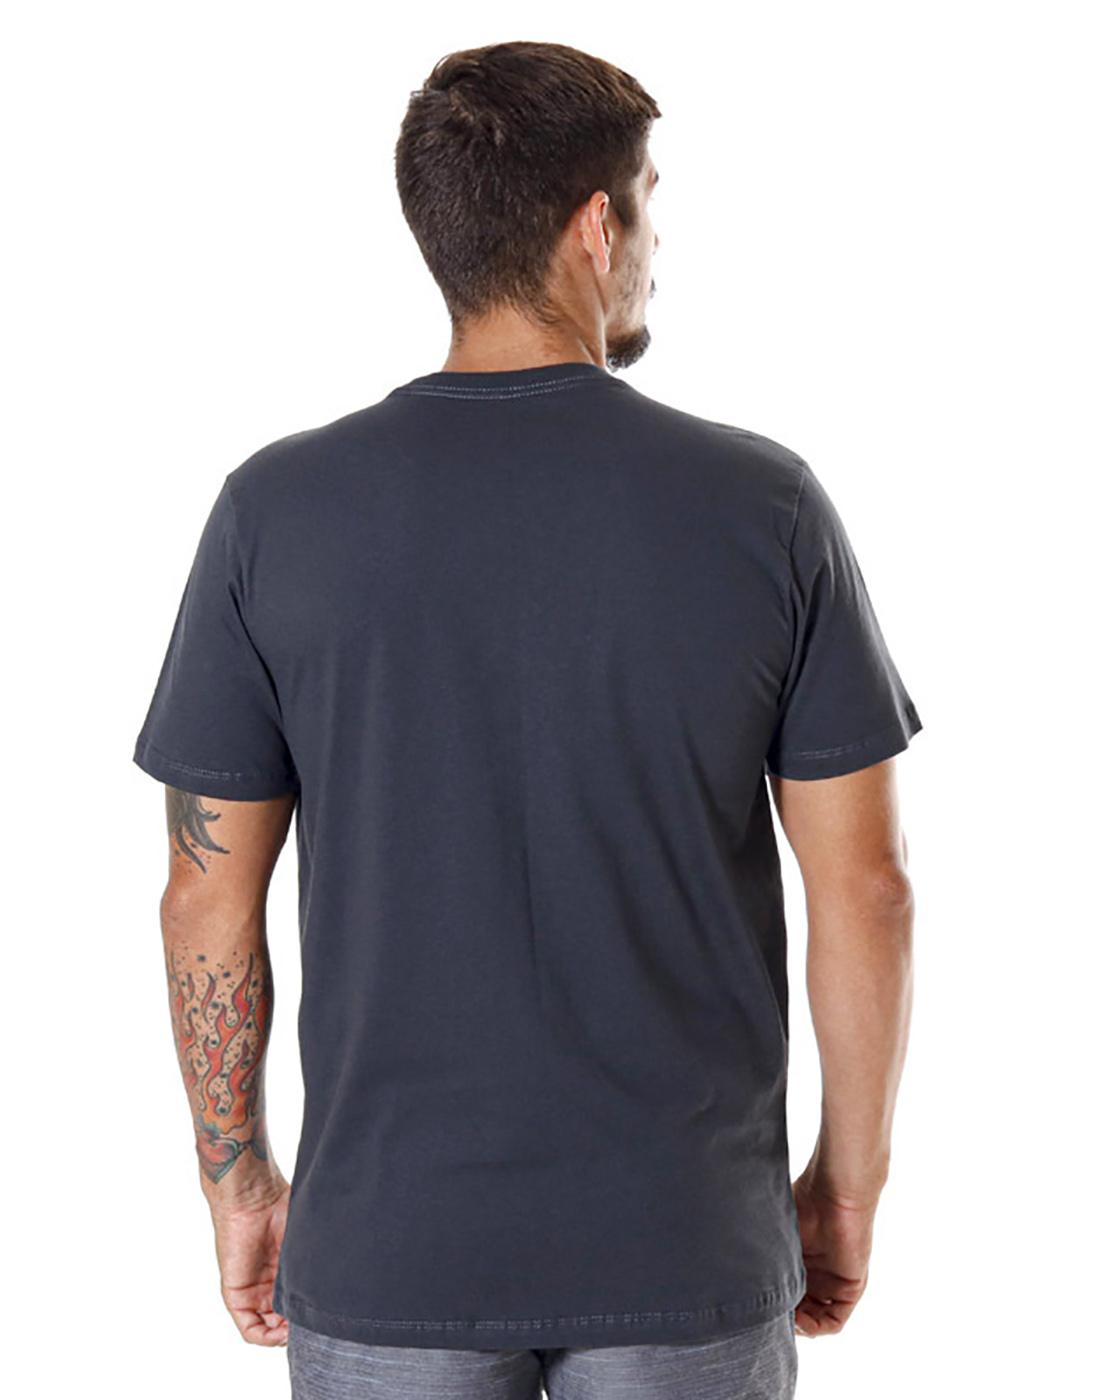 Camiseta Estampada Endorfina Chumbo Pena